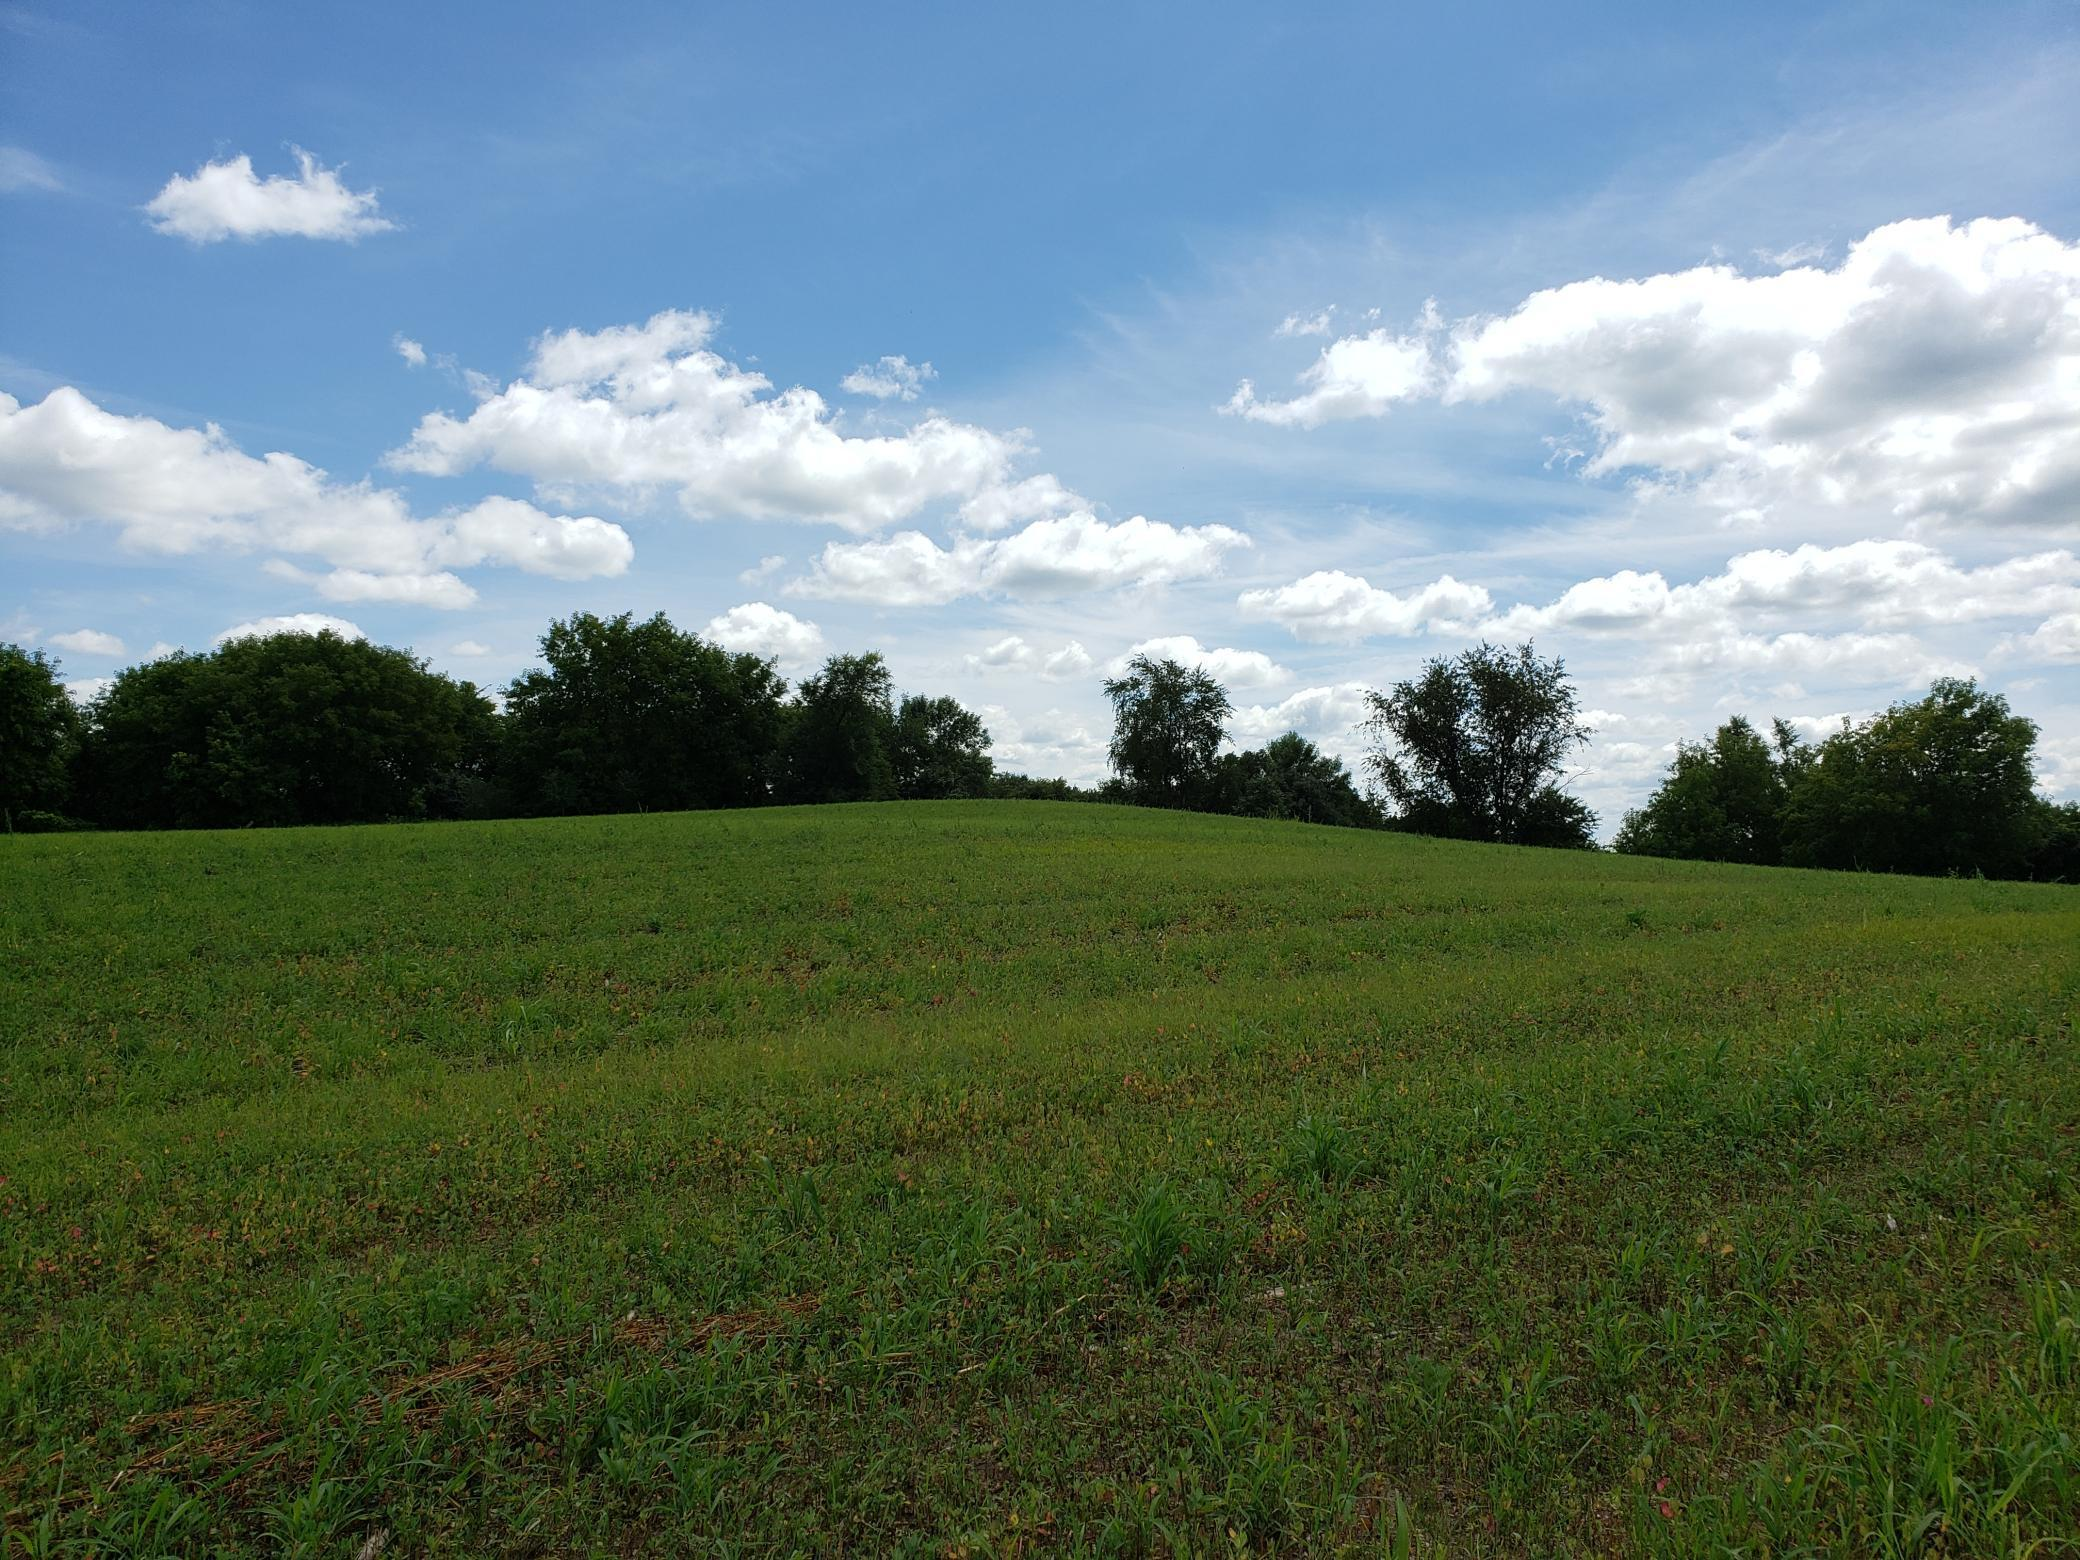 Lot 5 State Highway 15, Kimball MN 55353 - Photo 2